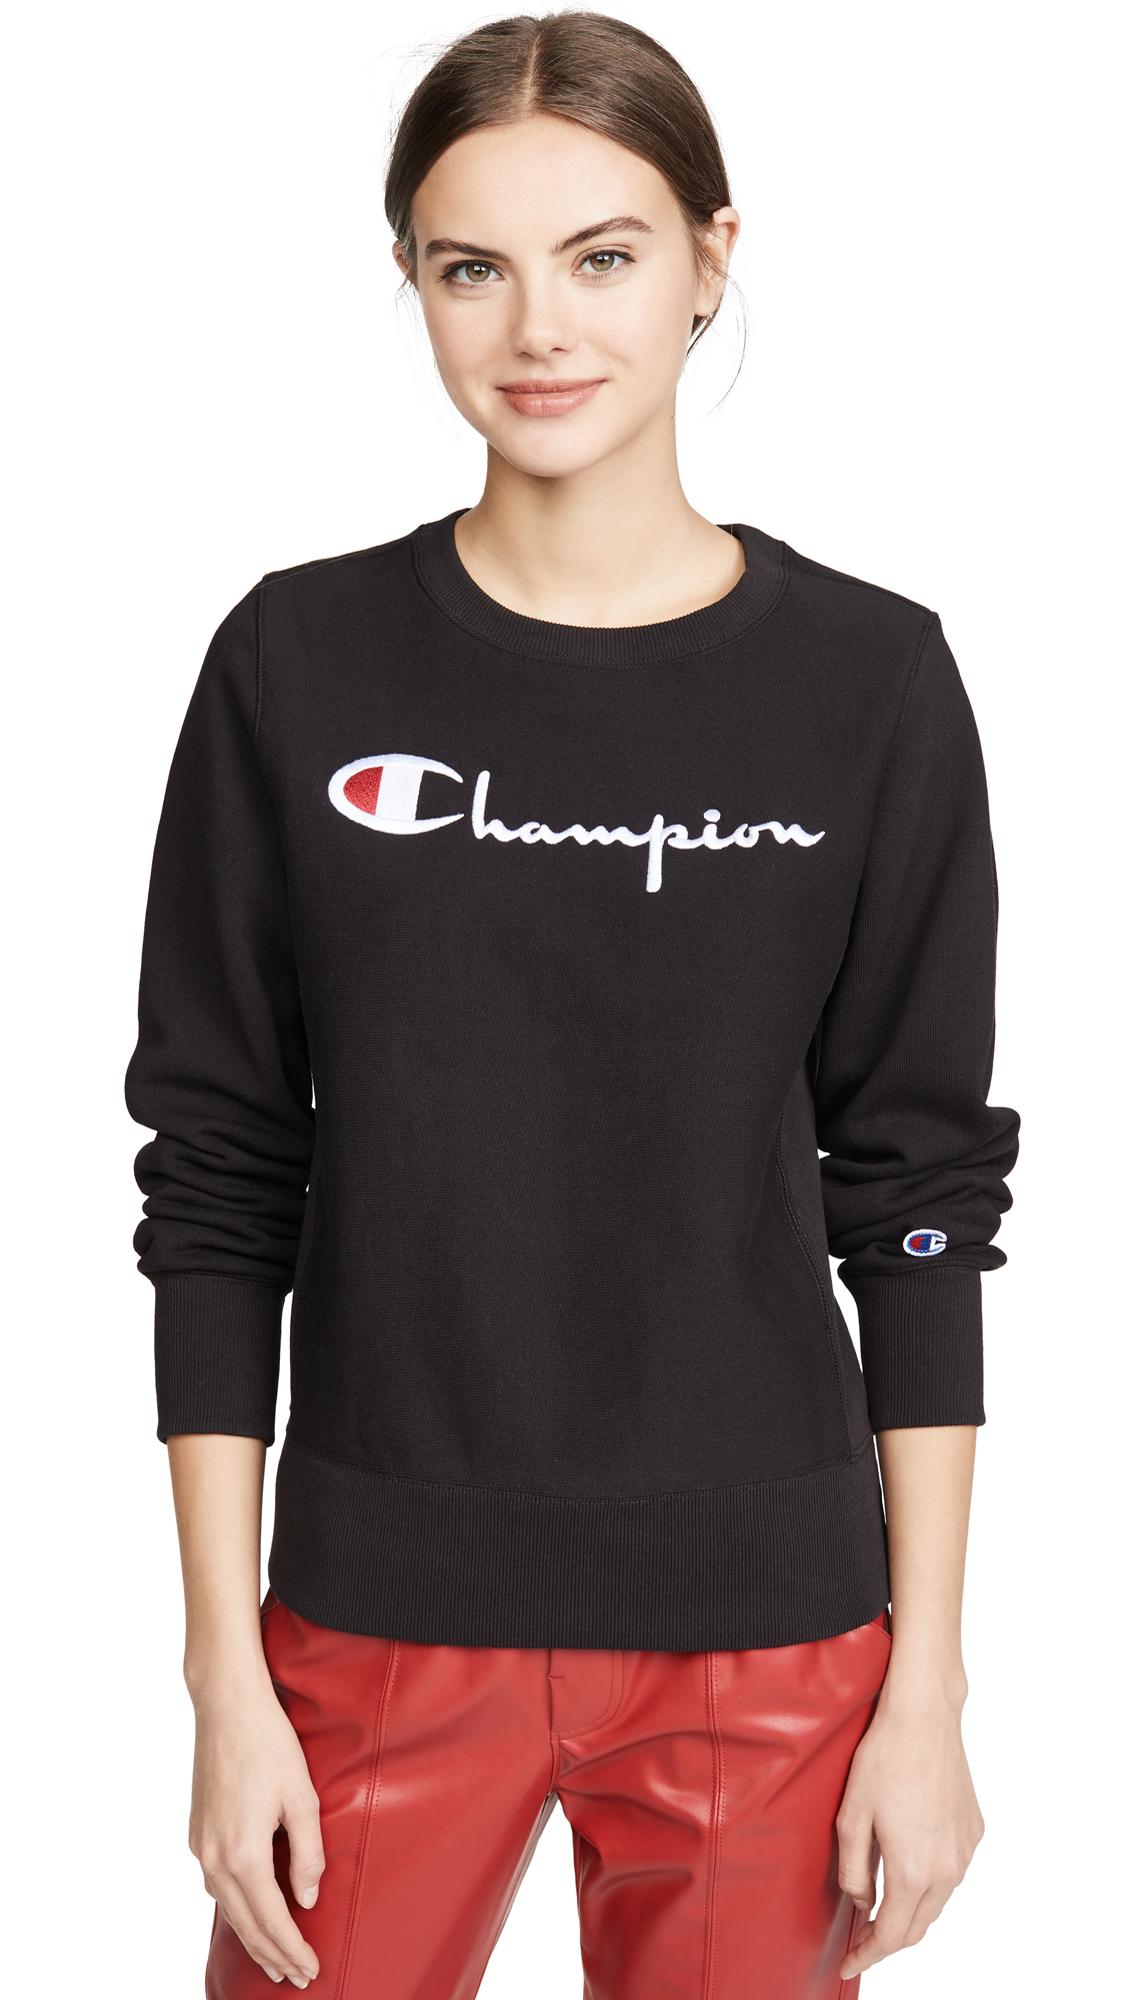 Champion Premium Reverse Weave Big Script Crew Neck Sweatshirt - 60% Off Sale